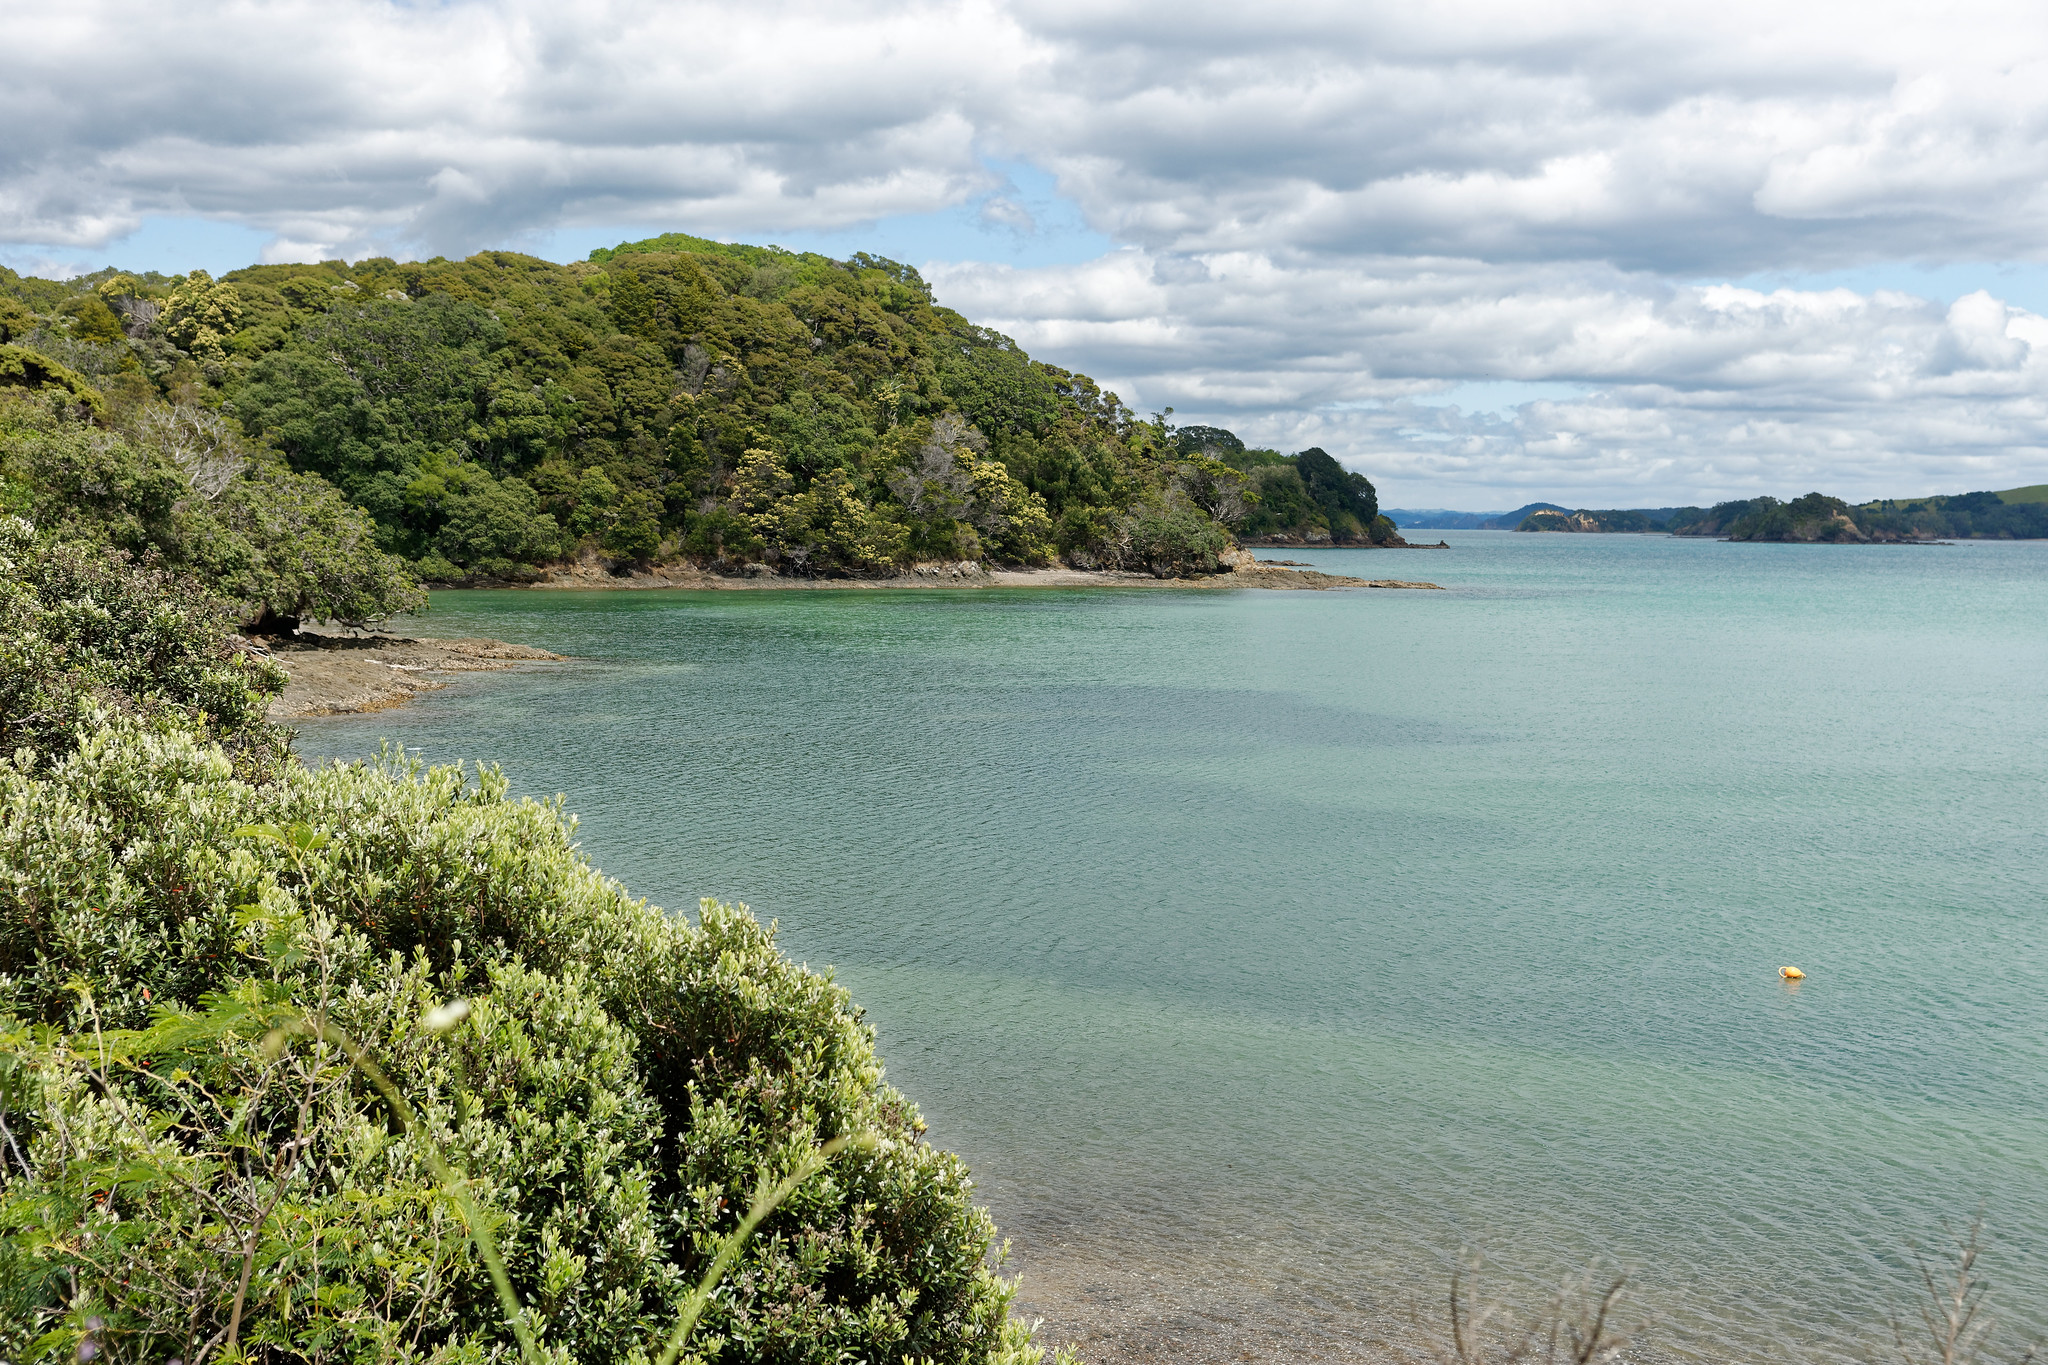 Rawhiti New Zeland